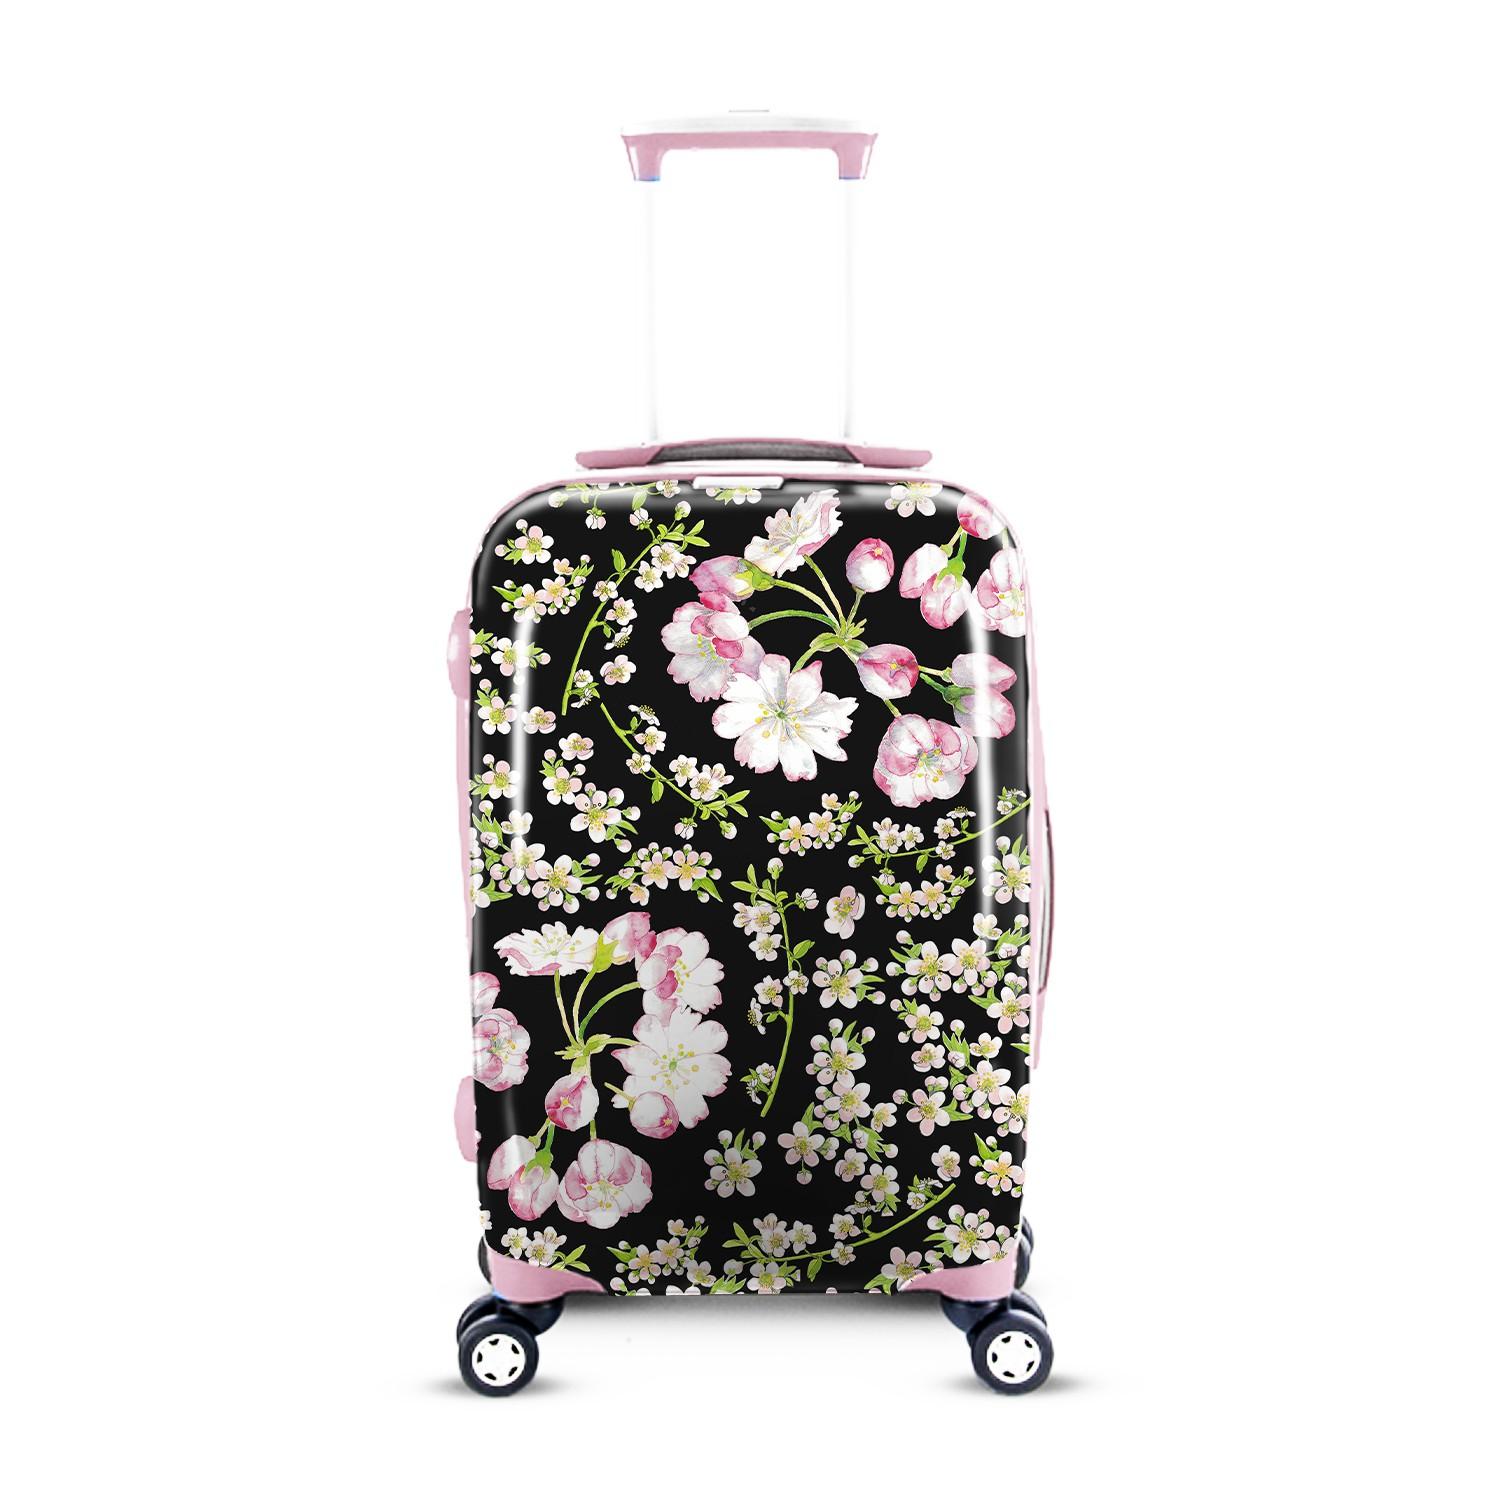 Create a Cherry Blossom Print for a Luggage Design